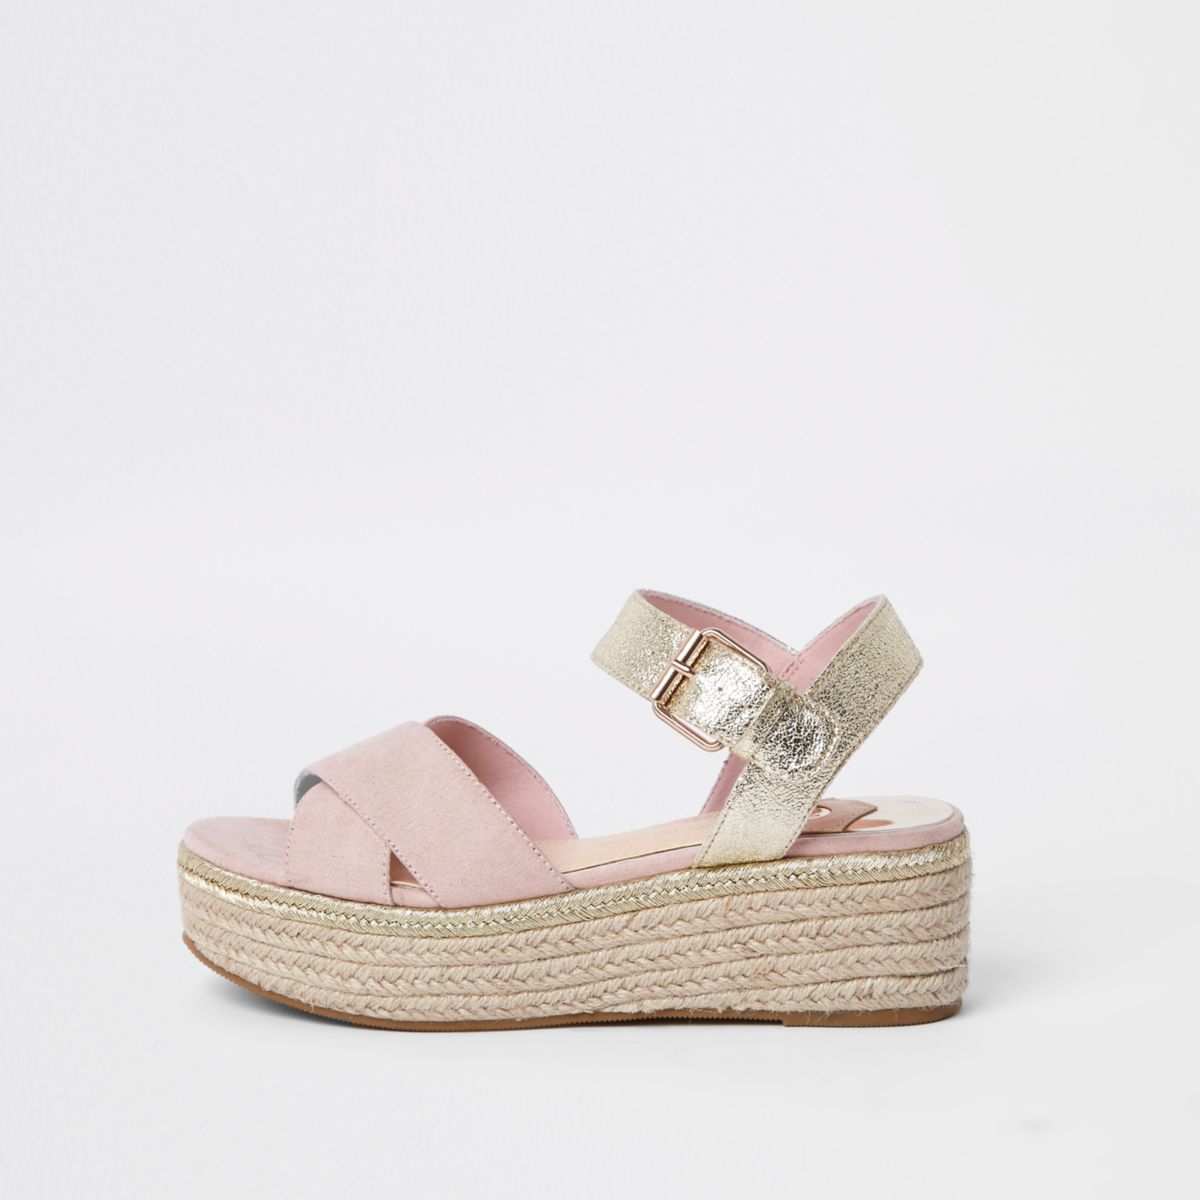 Light pink gold tone espadrille wedge sandals